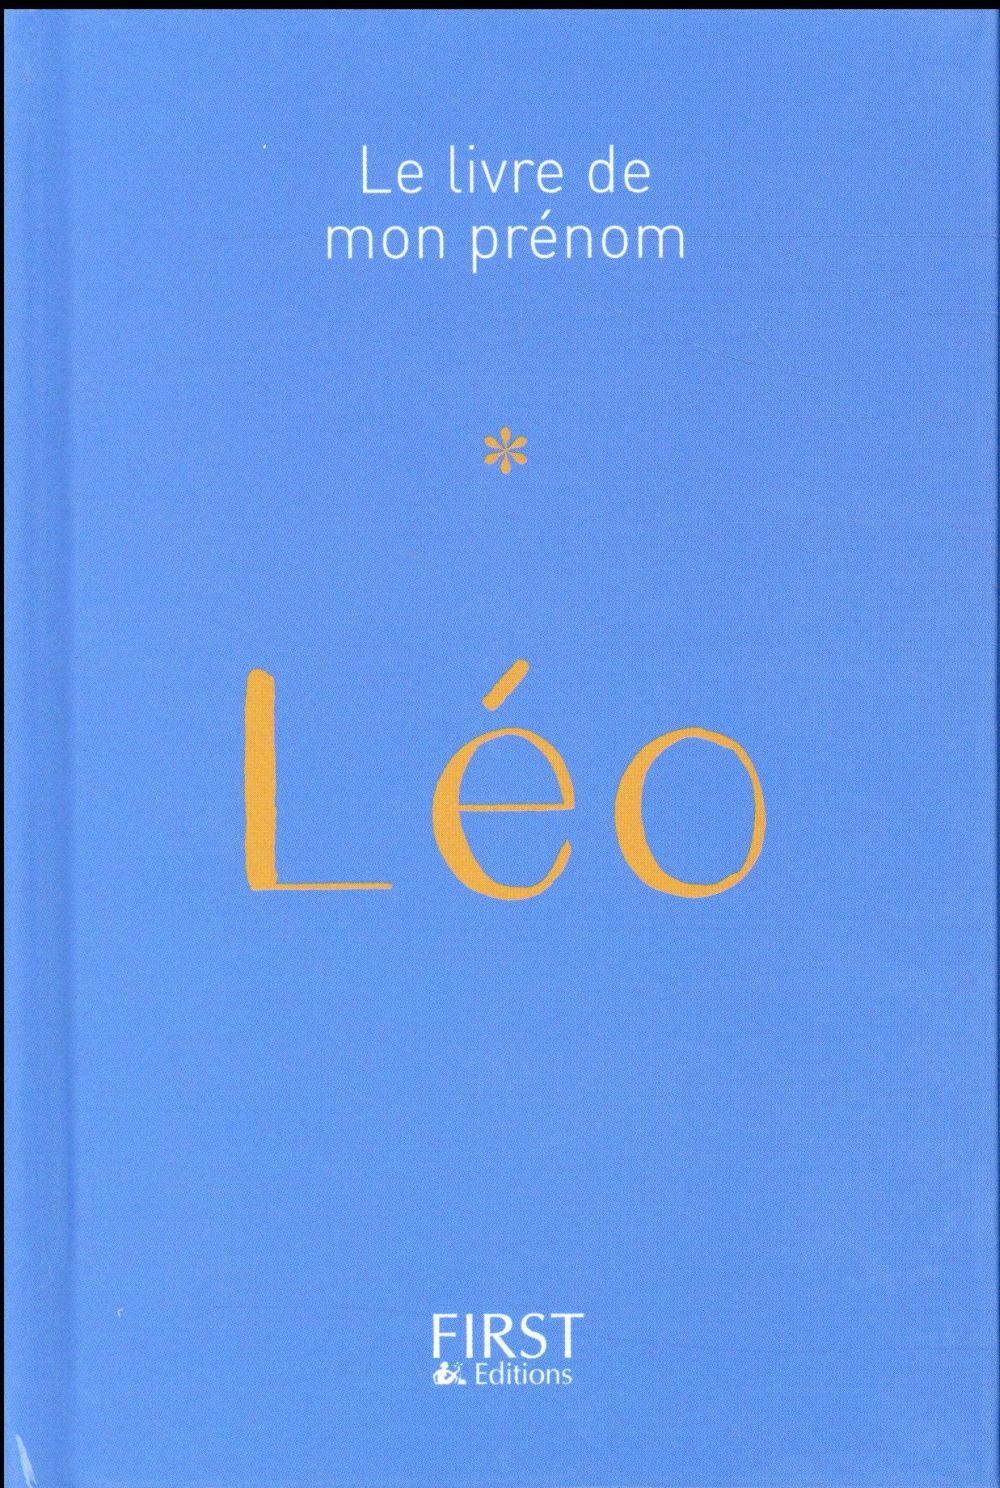 LEO Rapoport Stéphanie First Editions